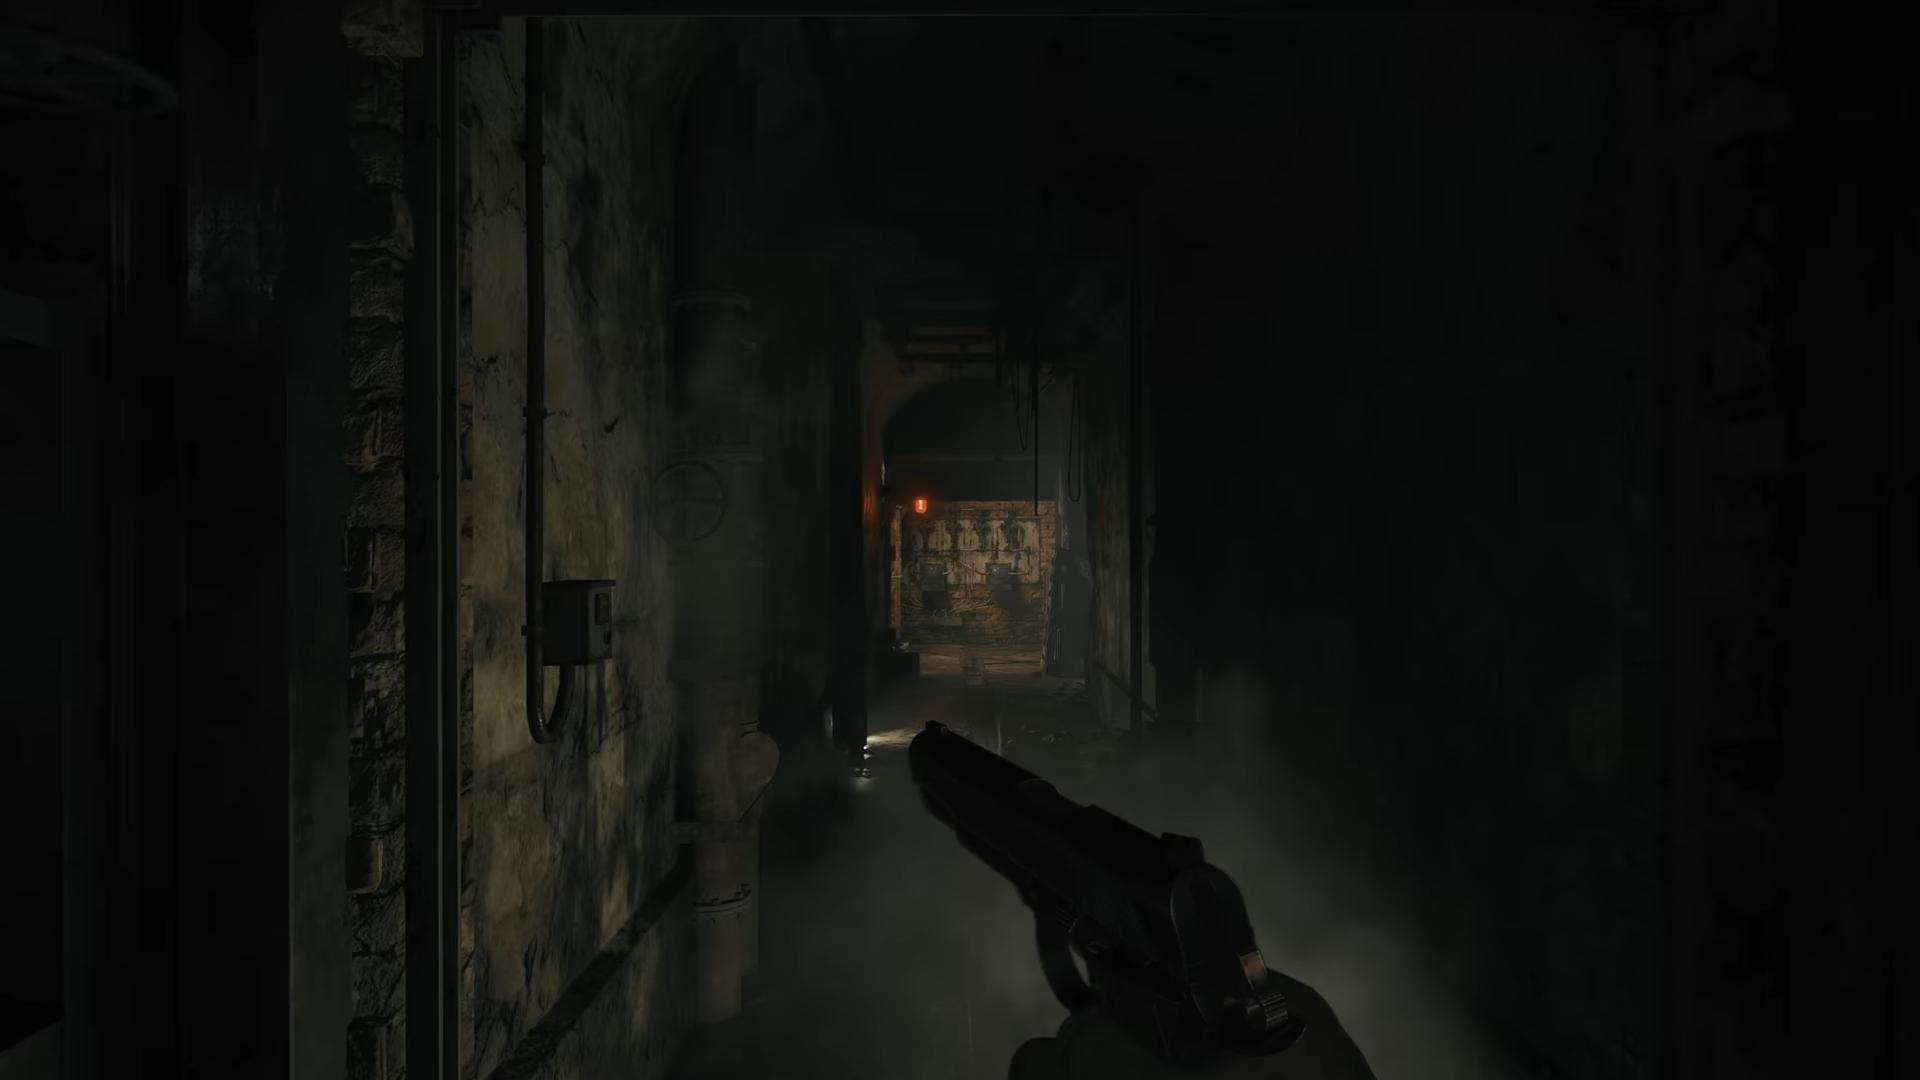 Media asset in full size related to 3dfxzone.it news item entitled as follows: Il lancio è vicino e Capcom presenta Resident Evil Village in 4K con HDR | Image Name: news31960_Resident-Evil-Villag-Screenshot_3.png